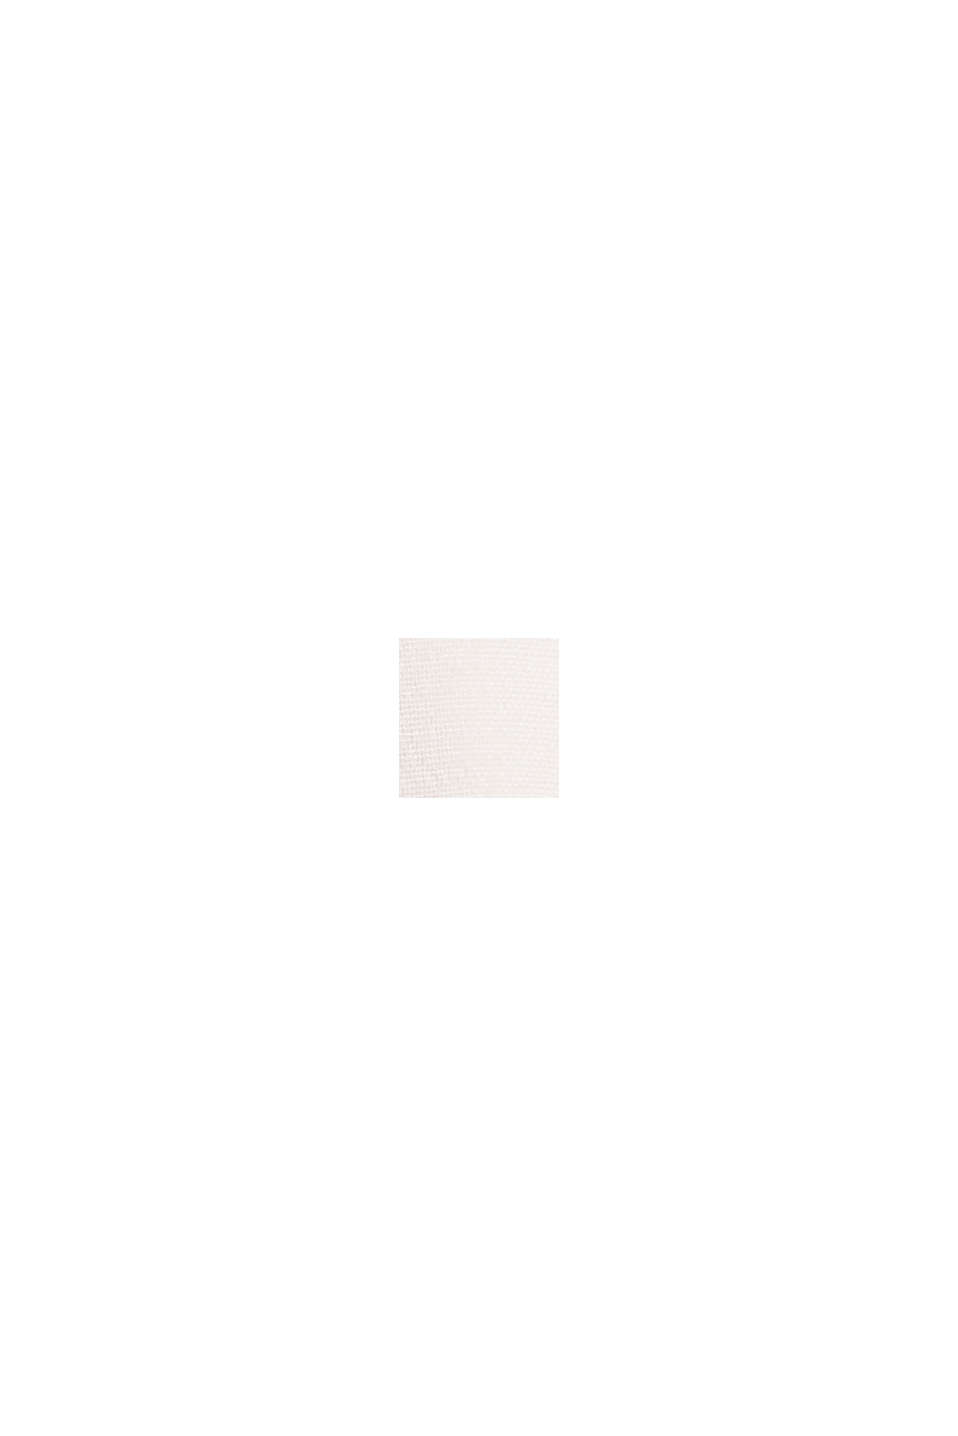 Blousetop van soepele crêpe/jersey, LIGHT PINK, swatch